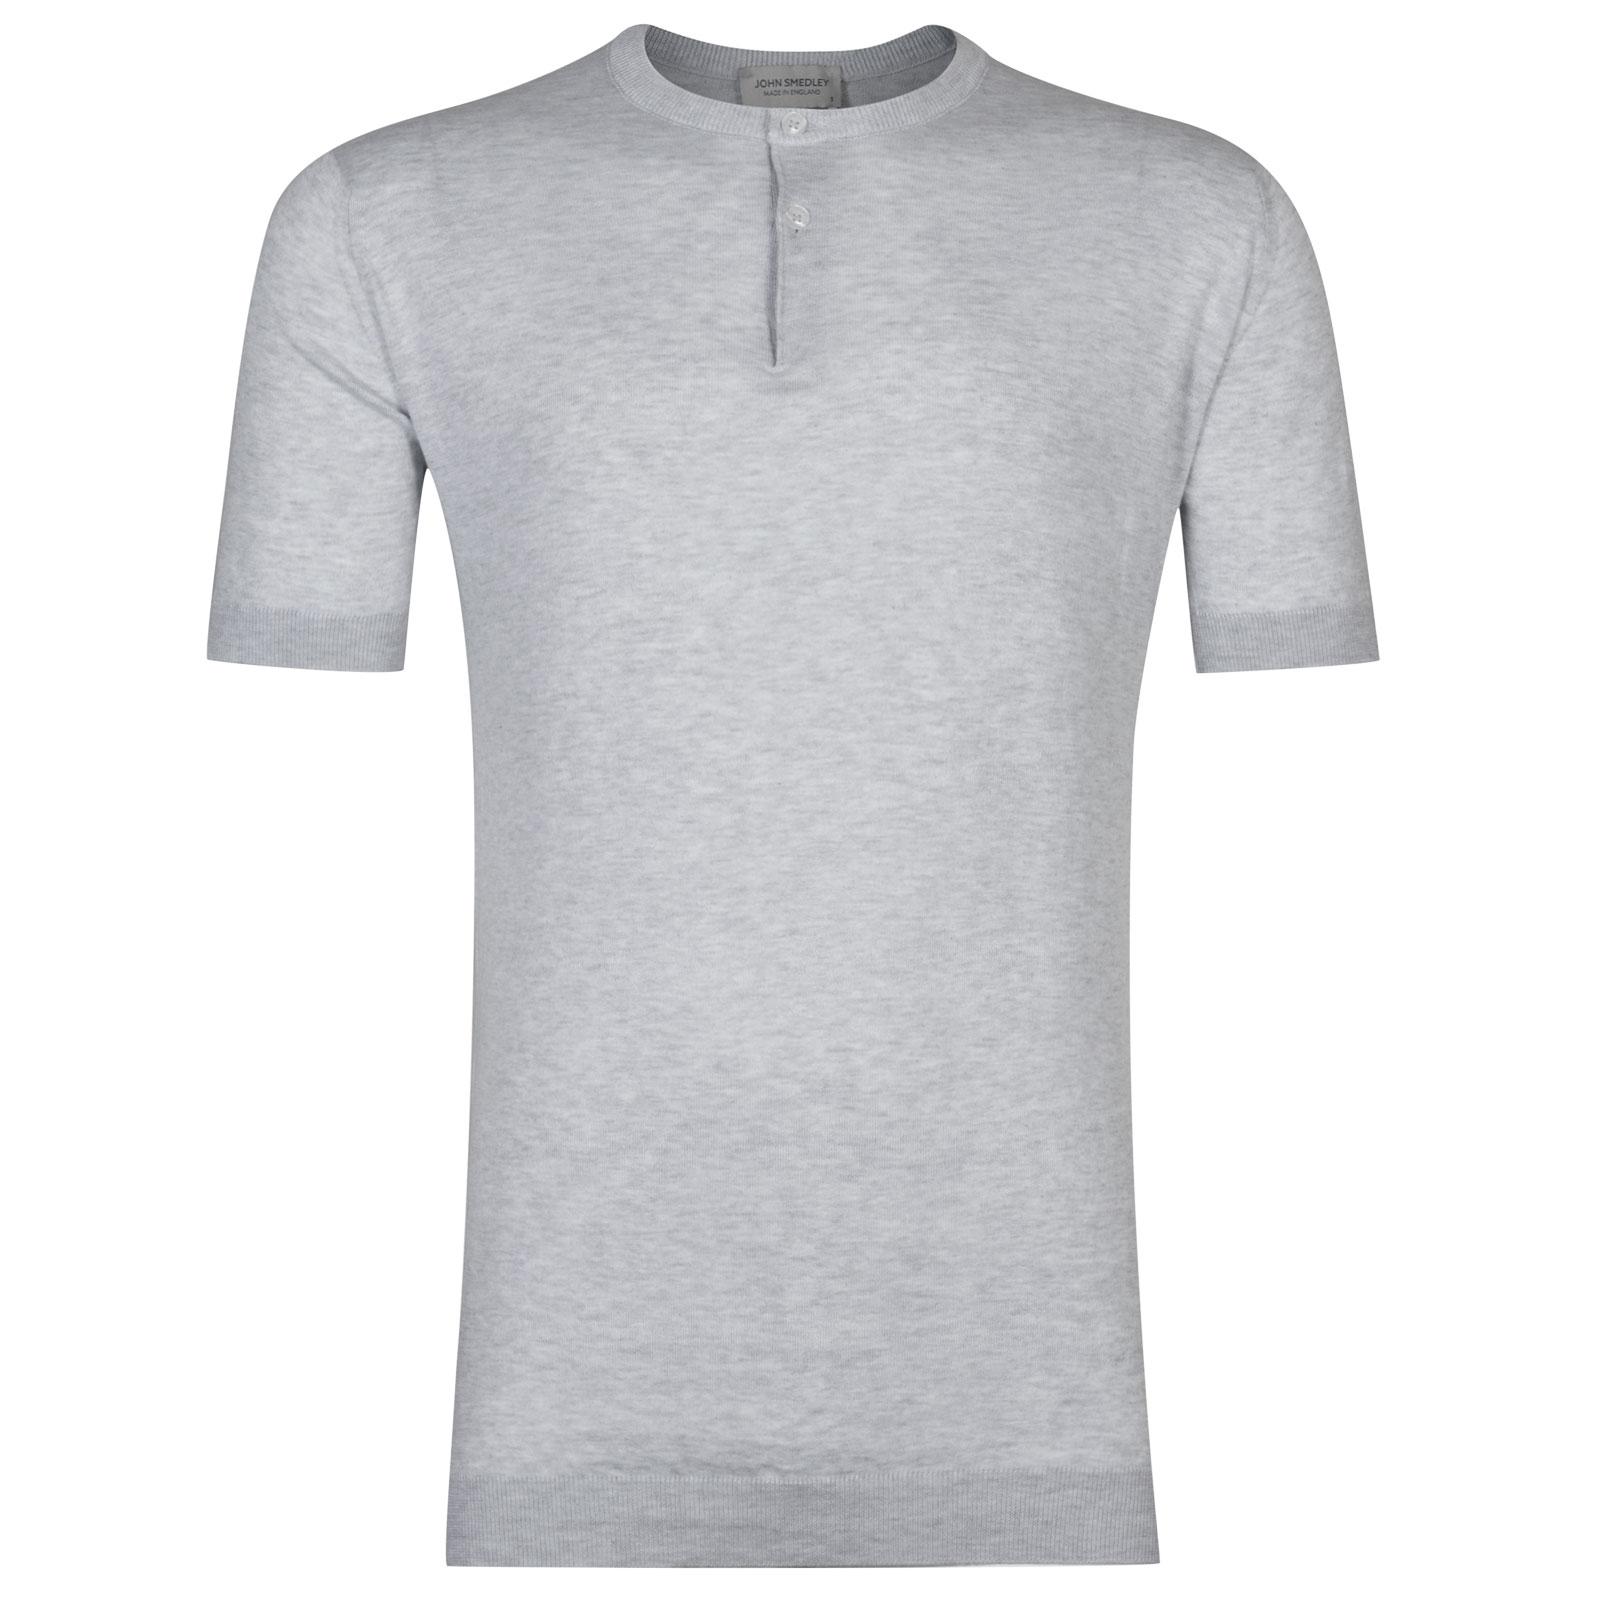 John Smedley Bennett Sea Island Cotton T-shirt in Feather Grey-XXL